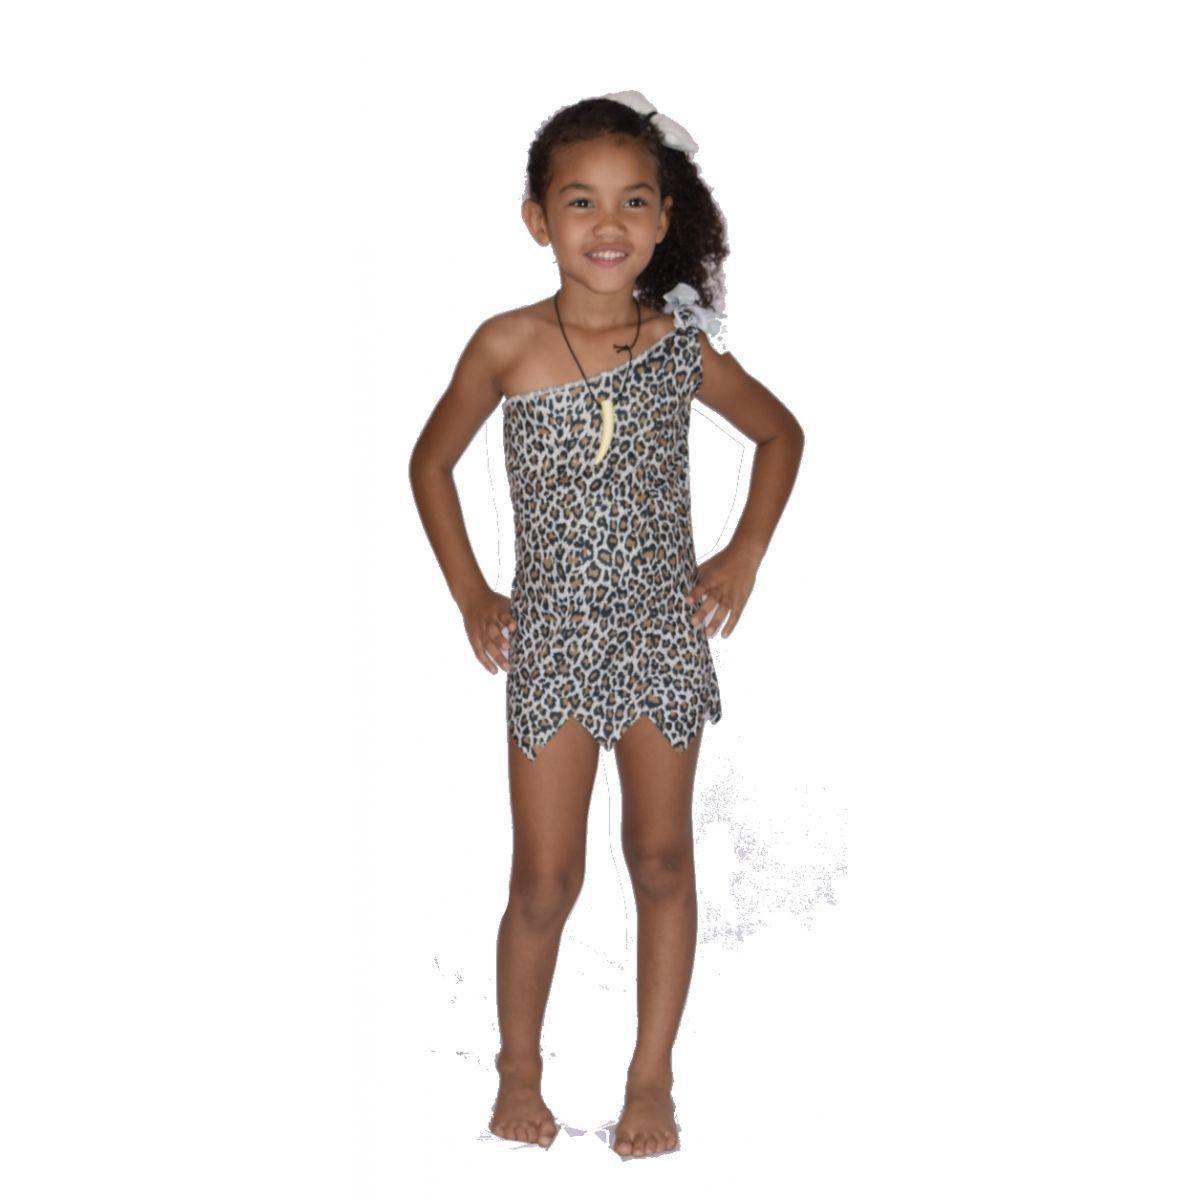 Fantasia Pedrita Flinstones - Infantil - Point Da Dança